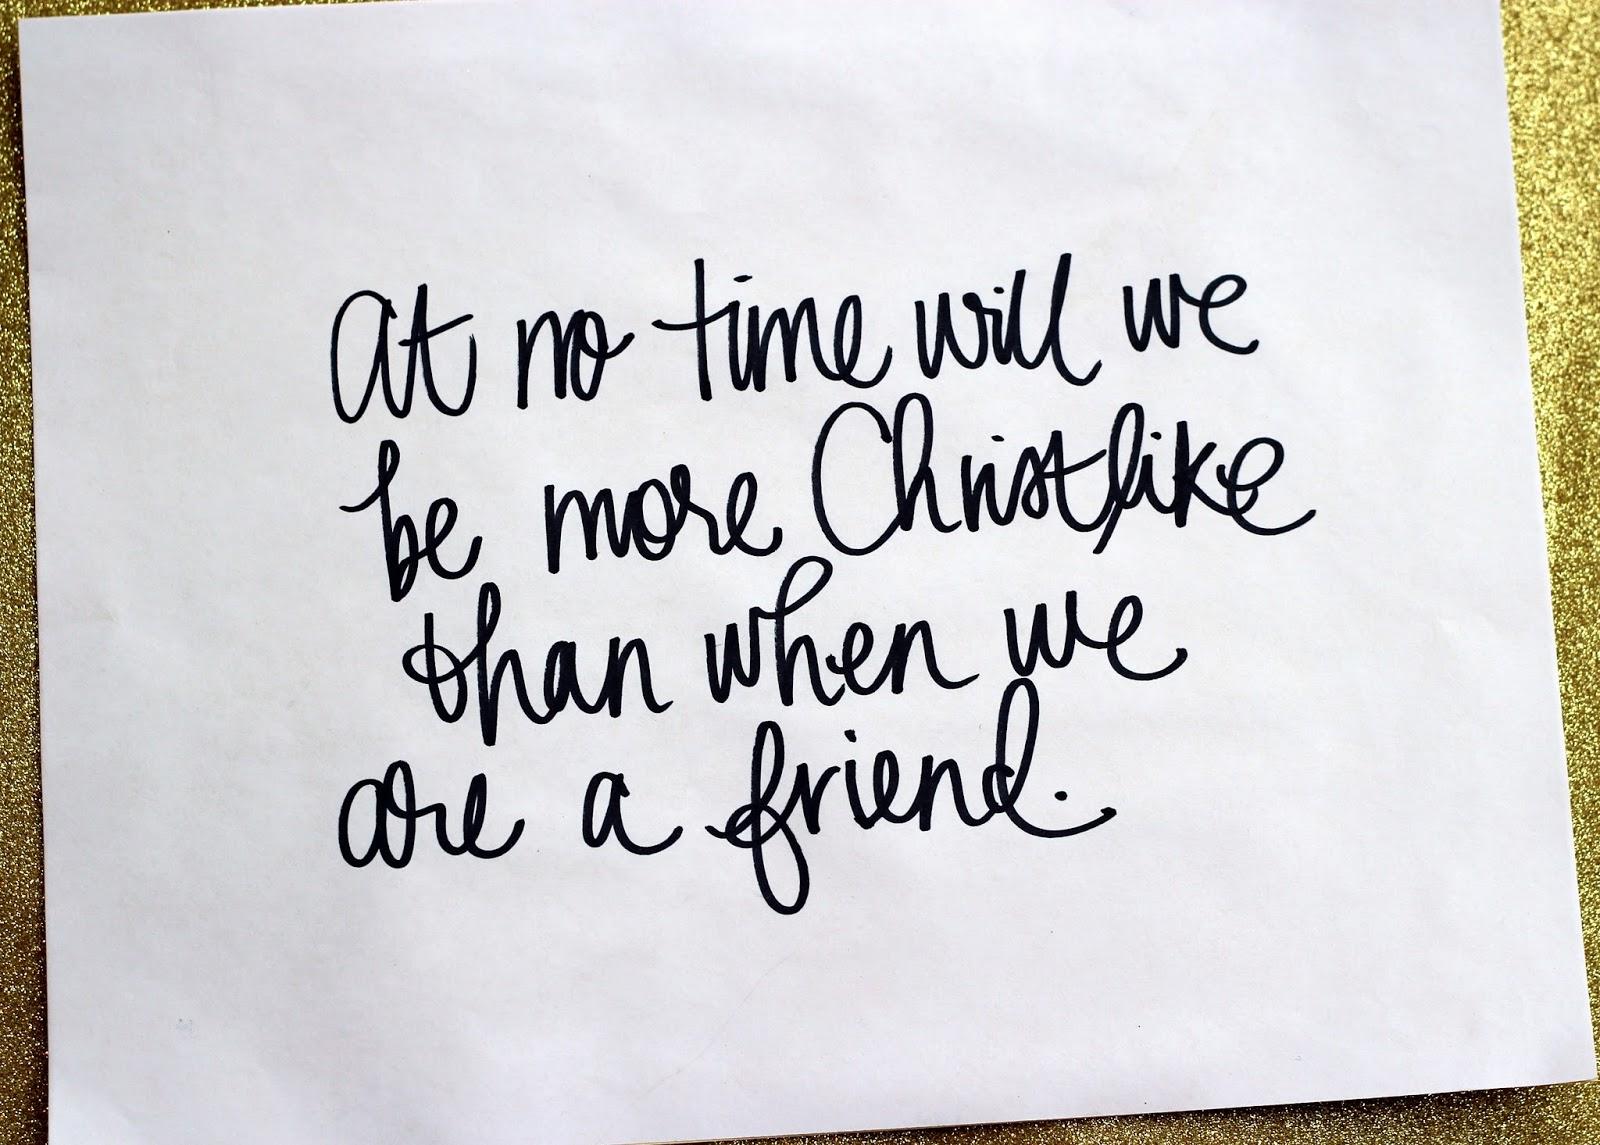 Quotes About Lost Friendship Quotesgram: Sad Quotes About Friendships Ending. QuotesGram